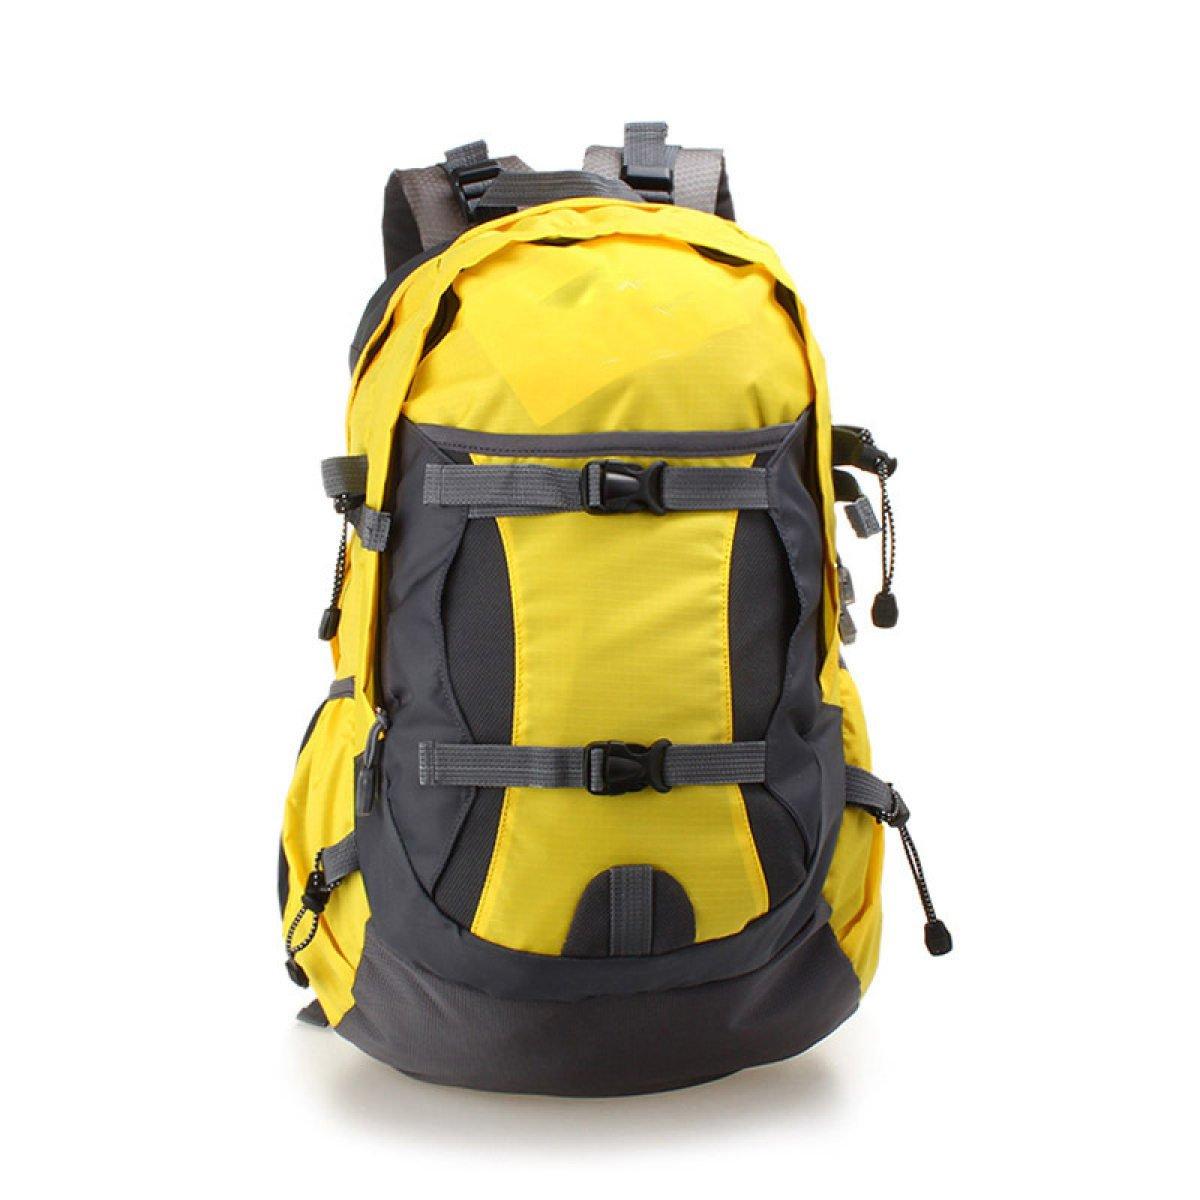 Nylon Trekking Schulter Tasche Faltbar Bergsteigen Tasche 40L